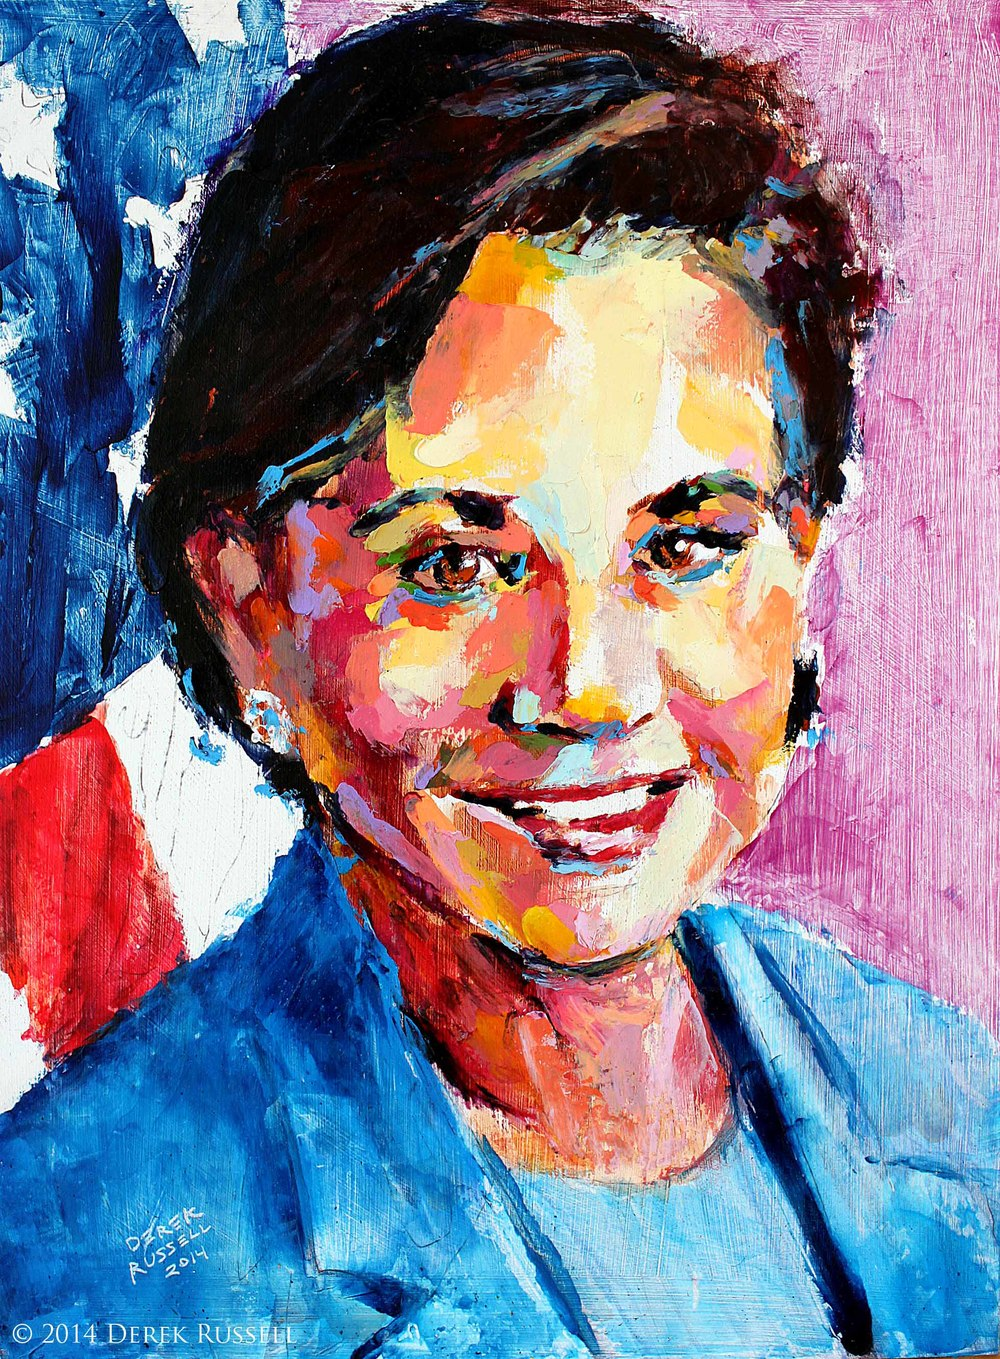 Penny Pritzker Original Oil Portrait Painting by Artist Derek Russell 2014.jpg